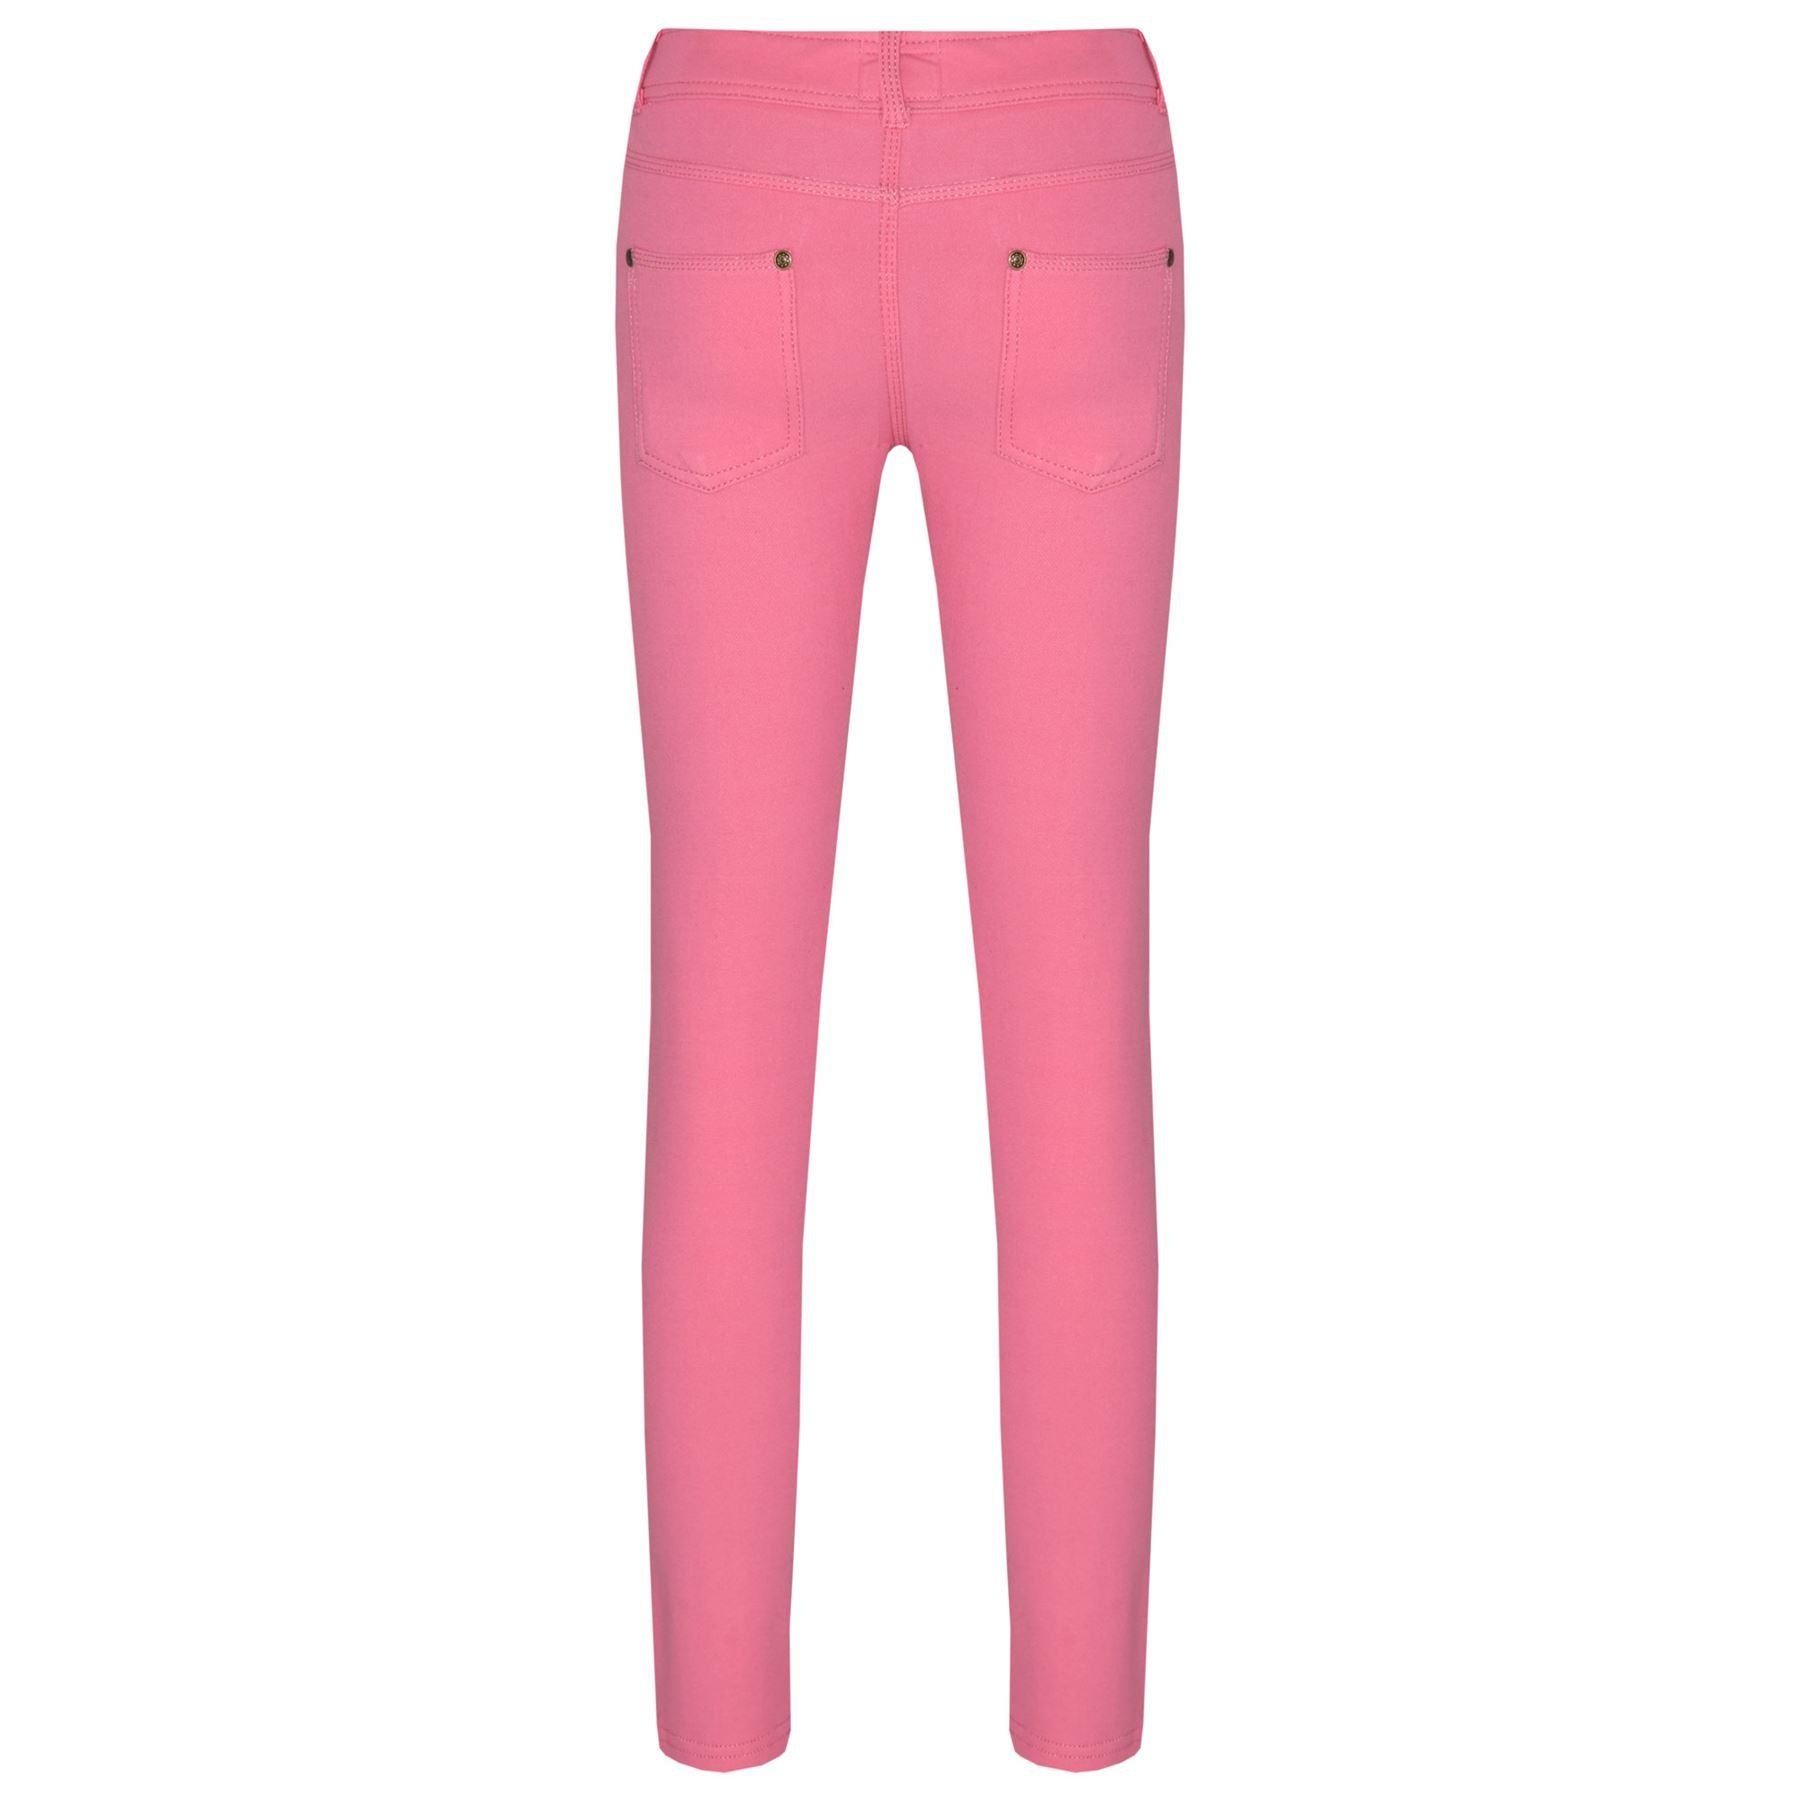 d8cbaa5a8a035 Girls Skinny Jeans Kids Pink Stretchy Denim Jeggings Fit Pants ...